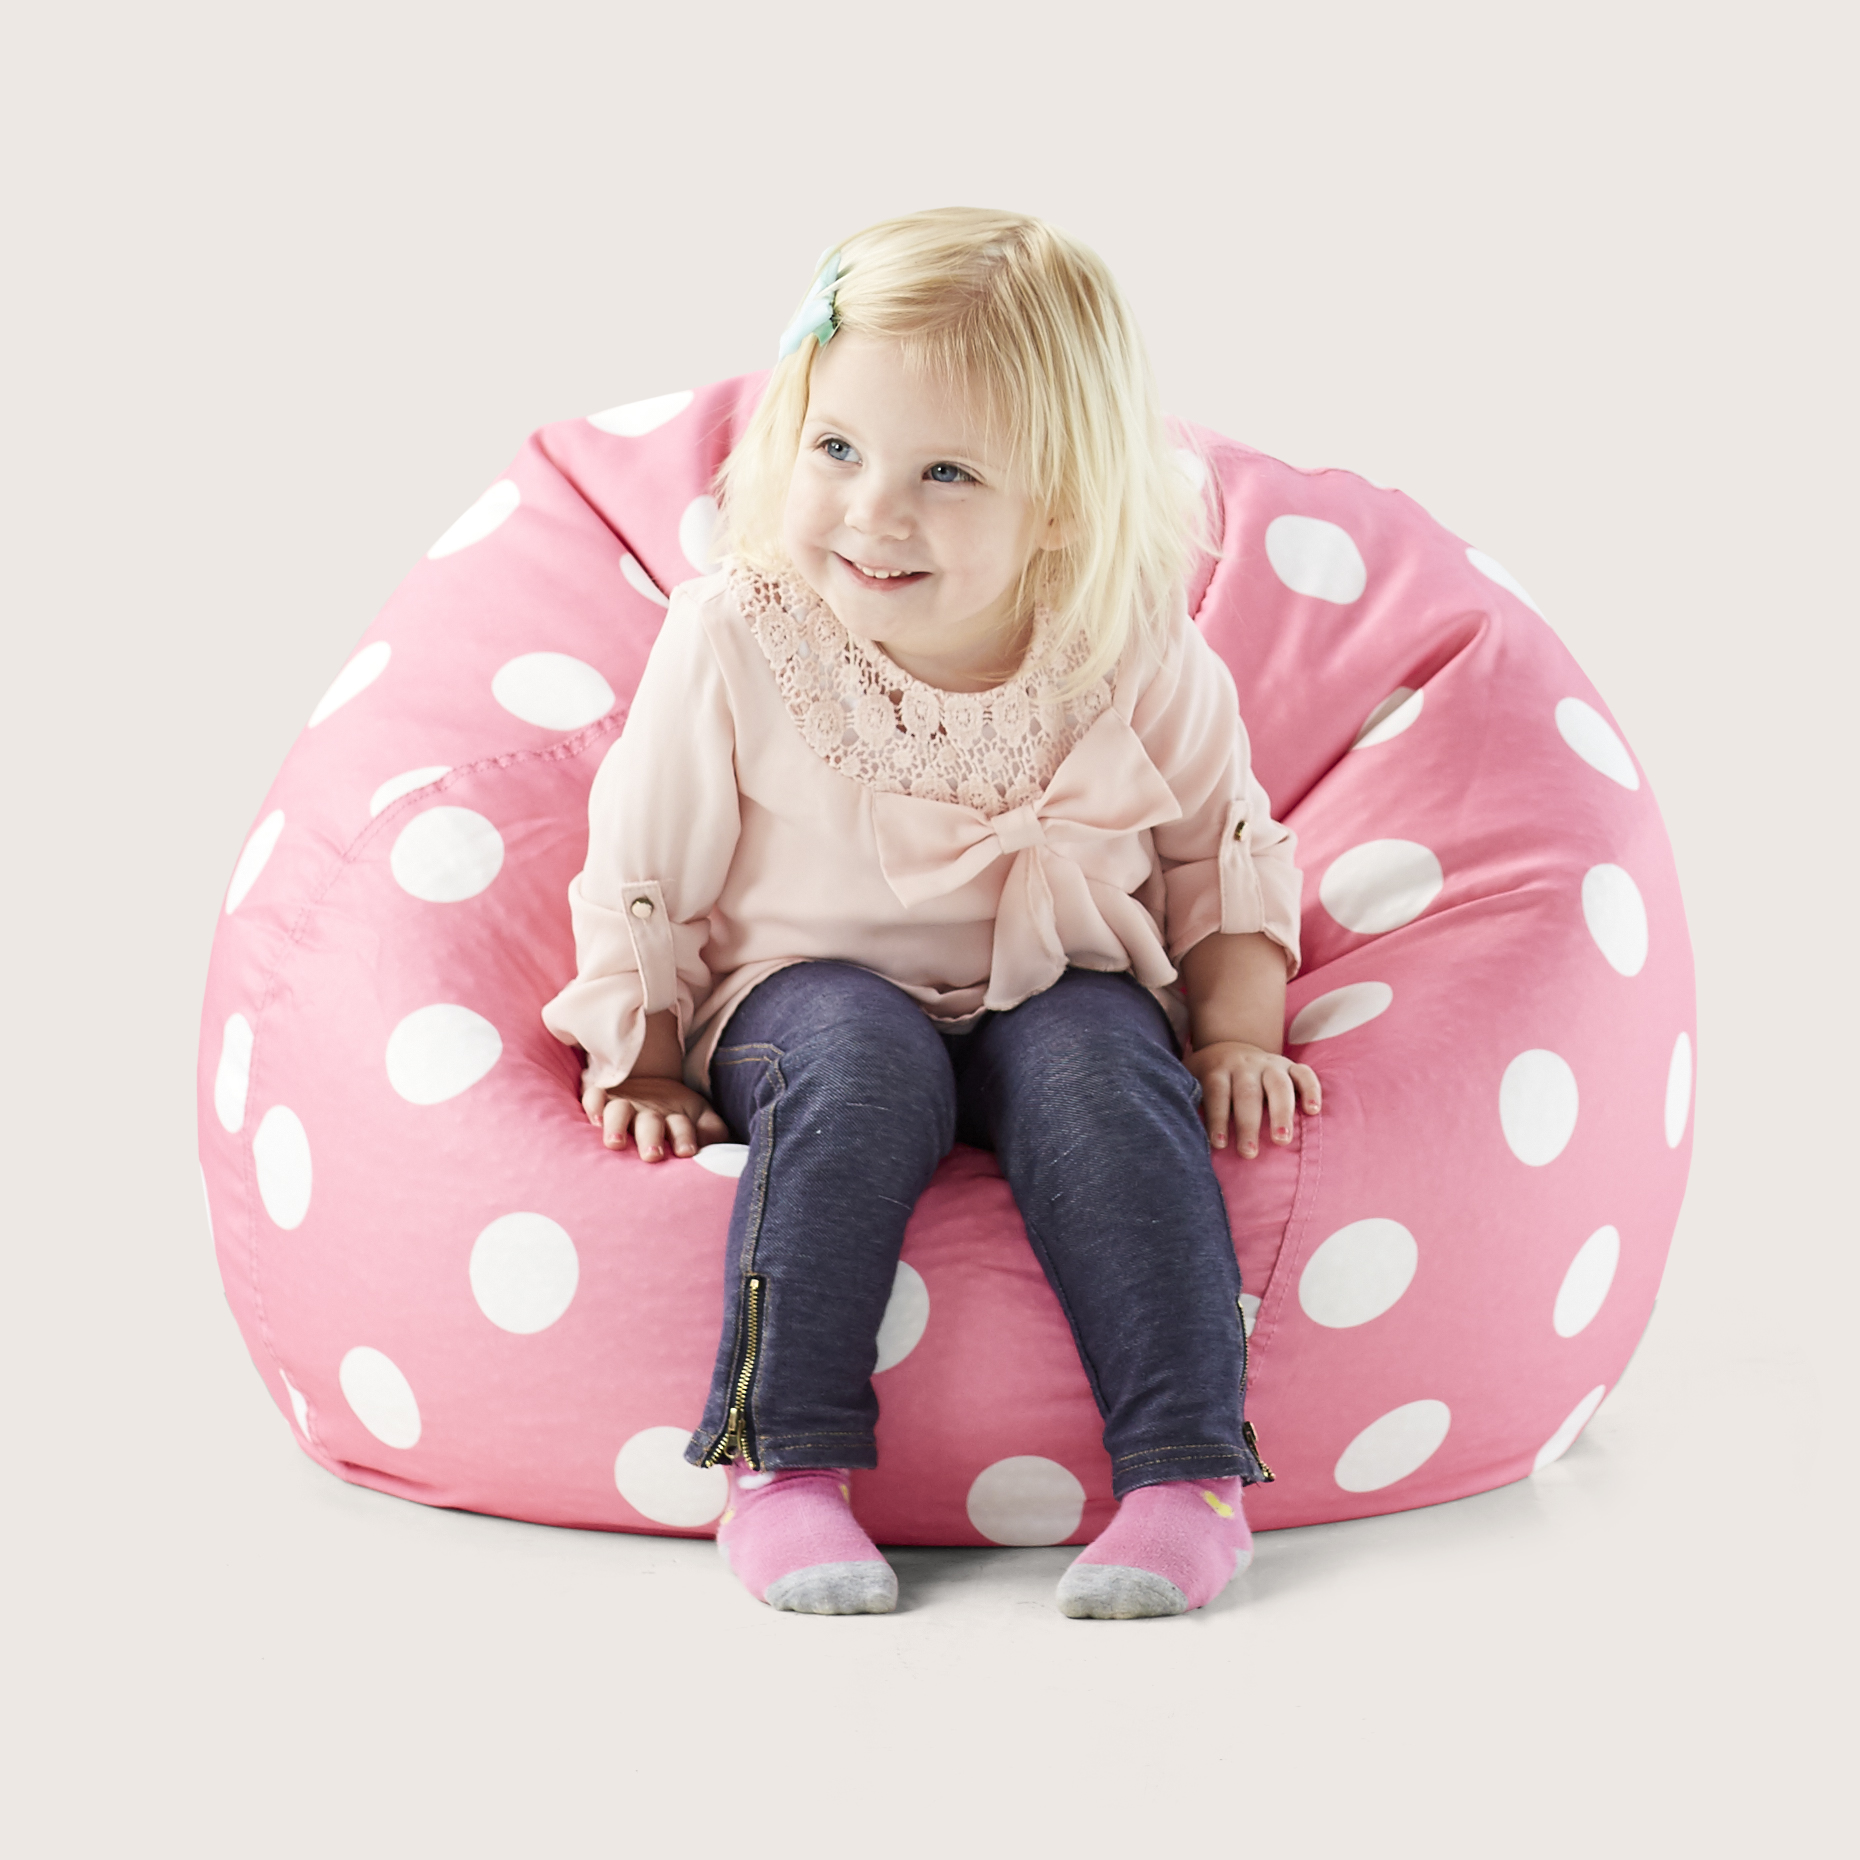 Big Joe Classic 88 Kids Polka Dot Bean Bag Chair, Multiple Colors